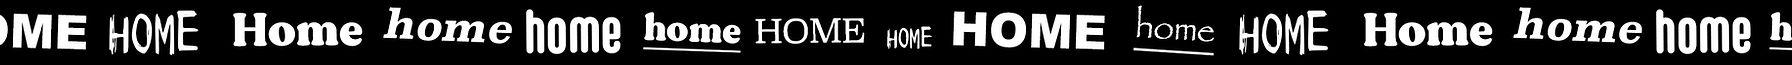 homebutton1.jpg